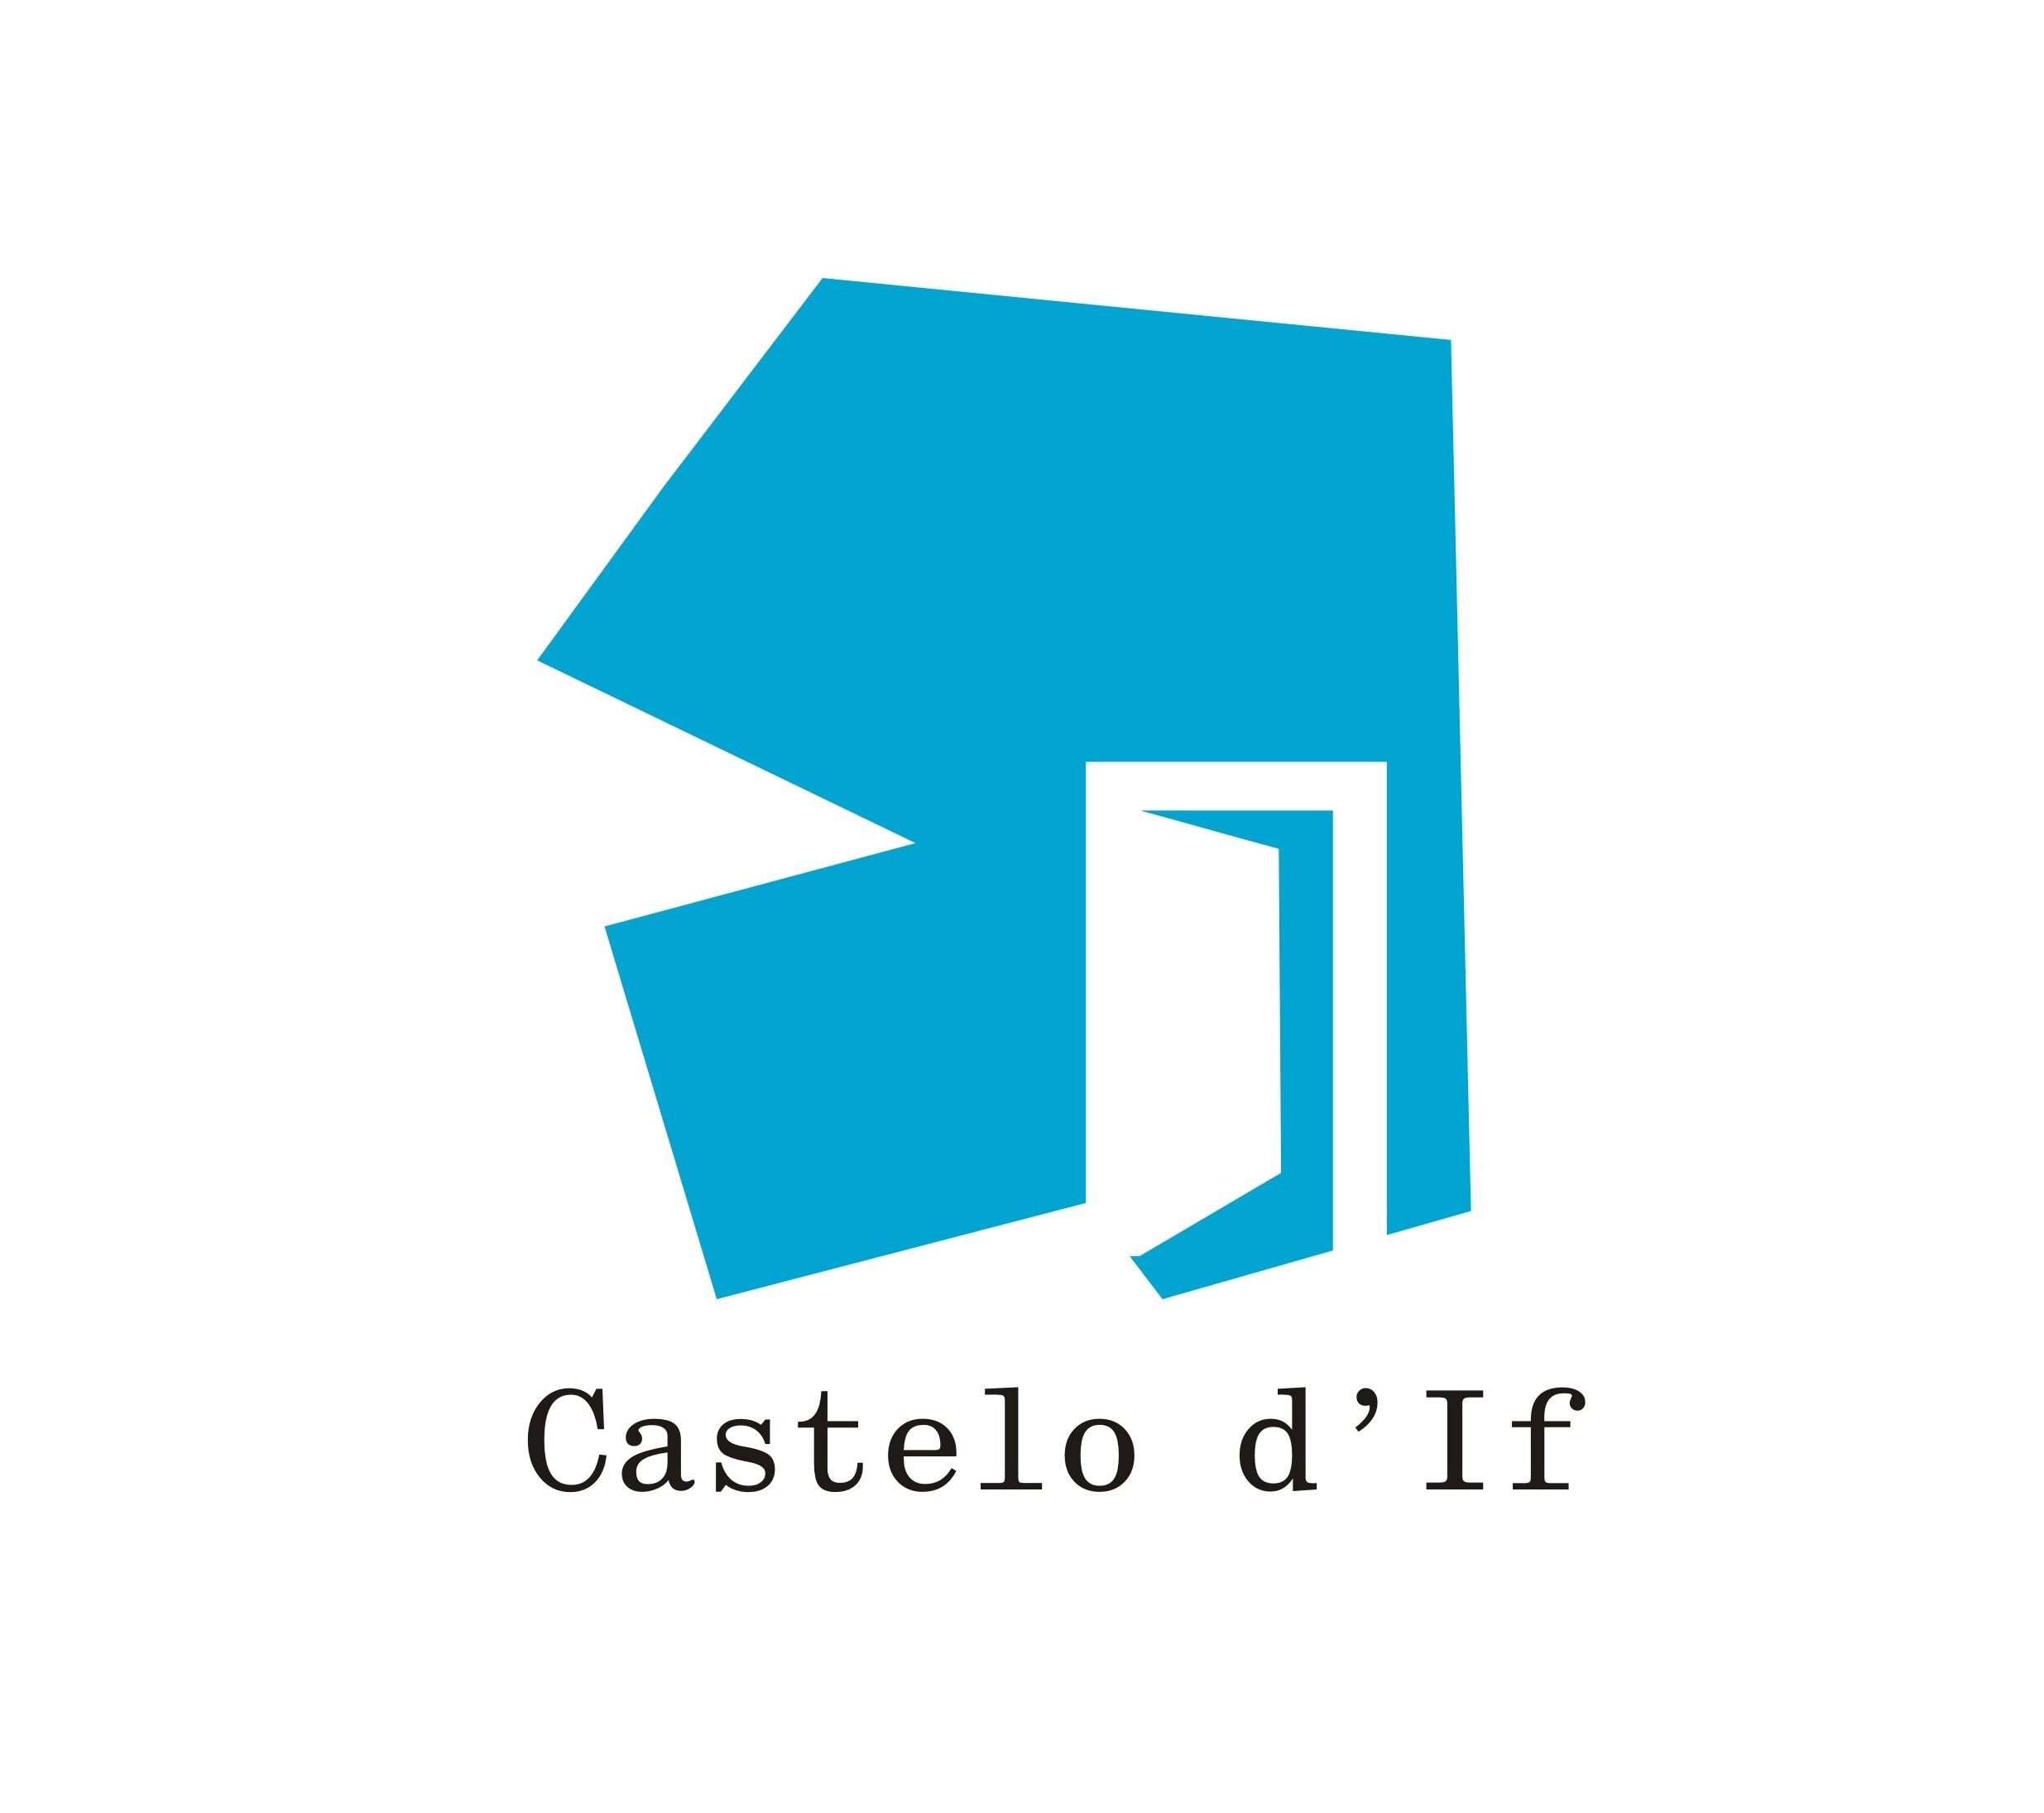 Logo Castelo d'If